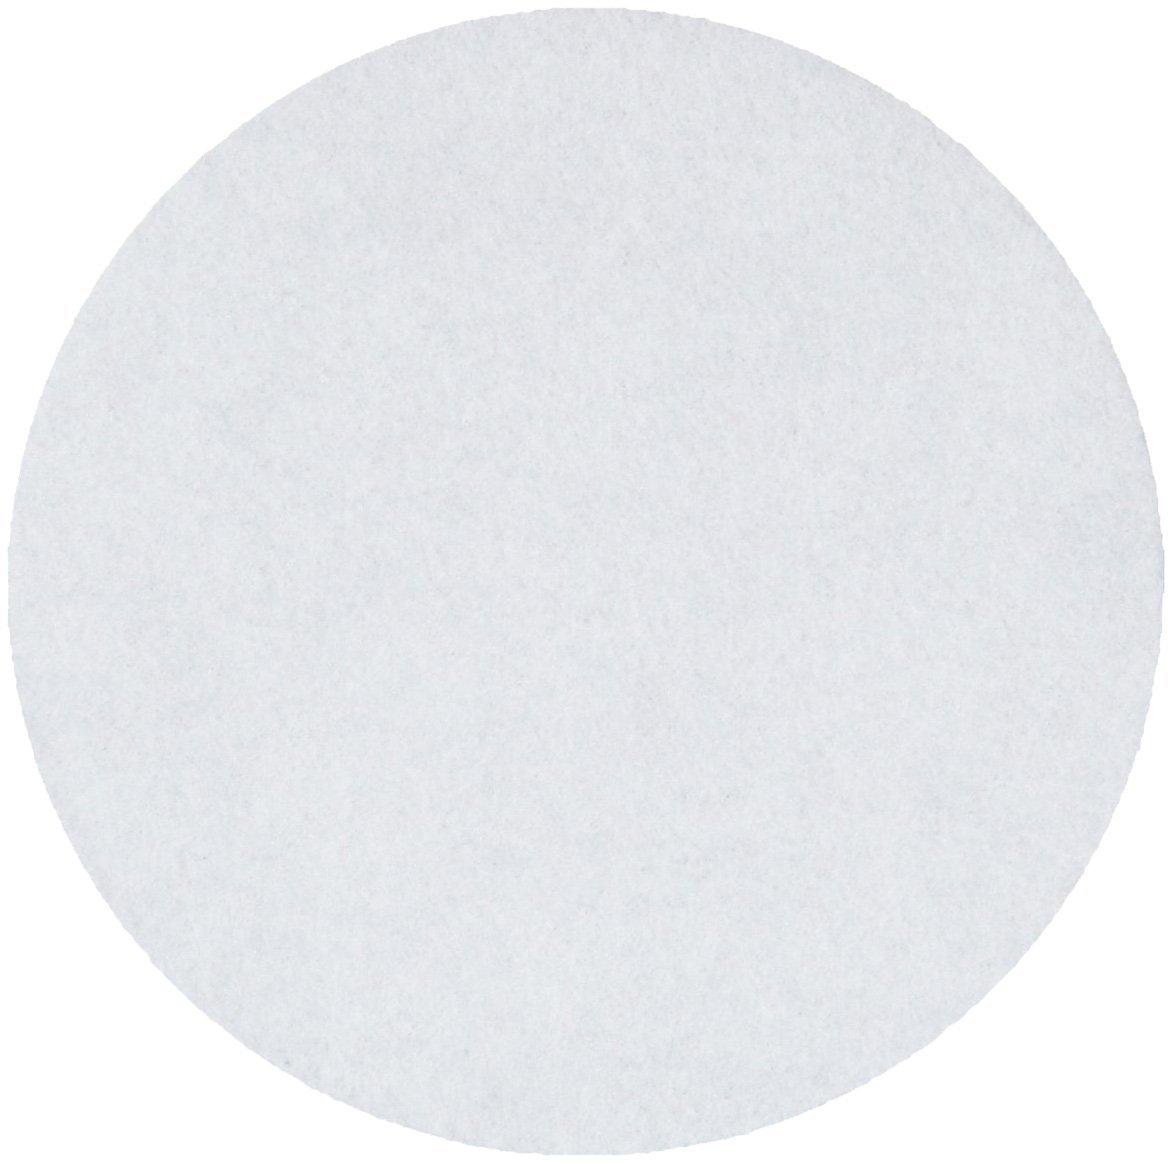 Whatman 10300014 Ashless Quantitative Filter Paper, 185mm Diameter, 12-25 Micron, Grade 589/1 (Pack of 100) by Whatman